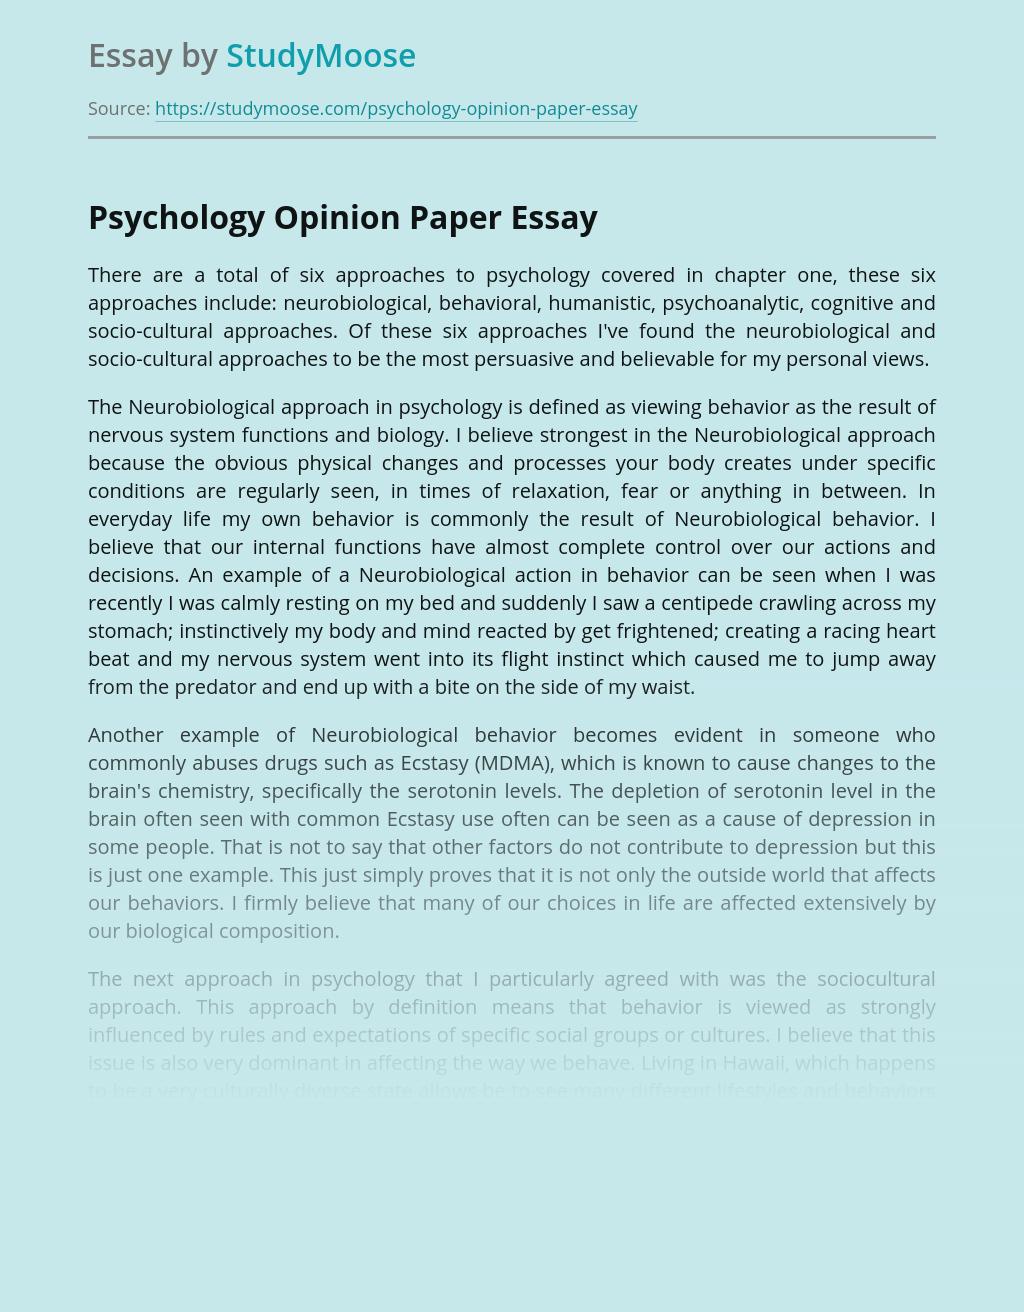 opinionated essay topics